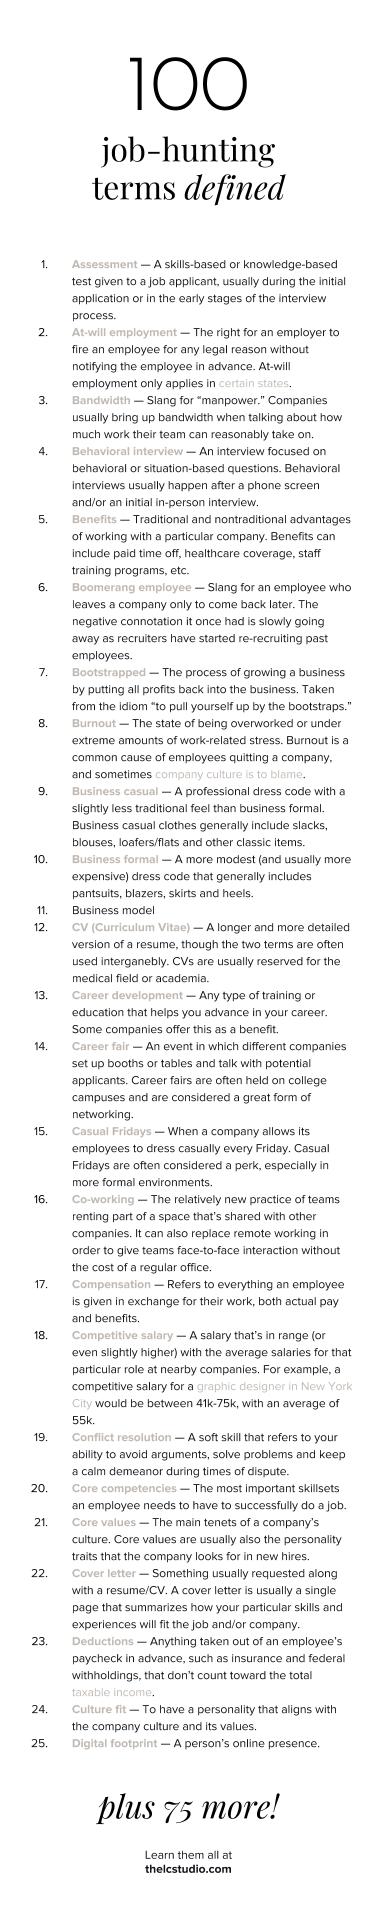 The Ultimate List Of Job Hunting Jargon 100 Terms To Know The Lc Studio Job Hunting Job Help Job Info